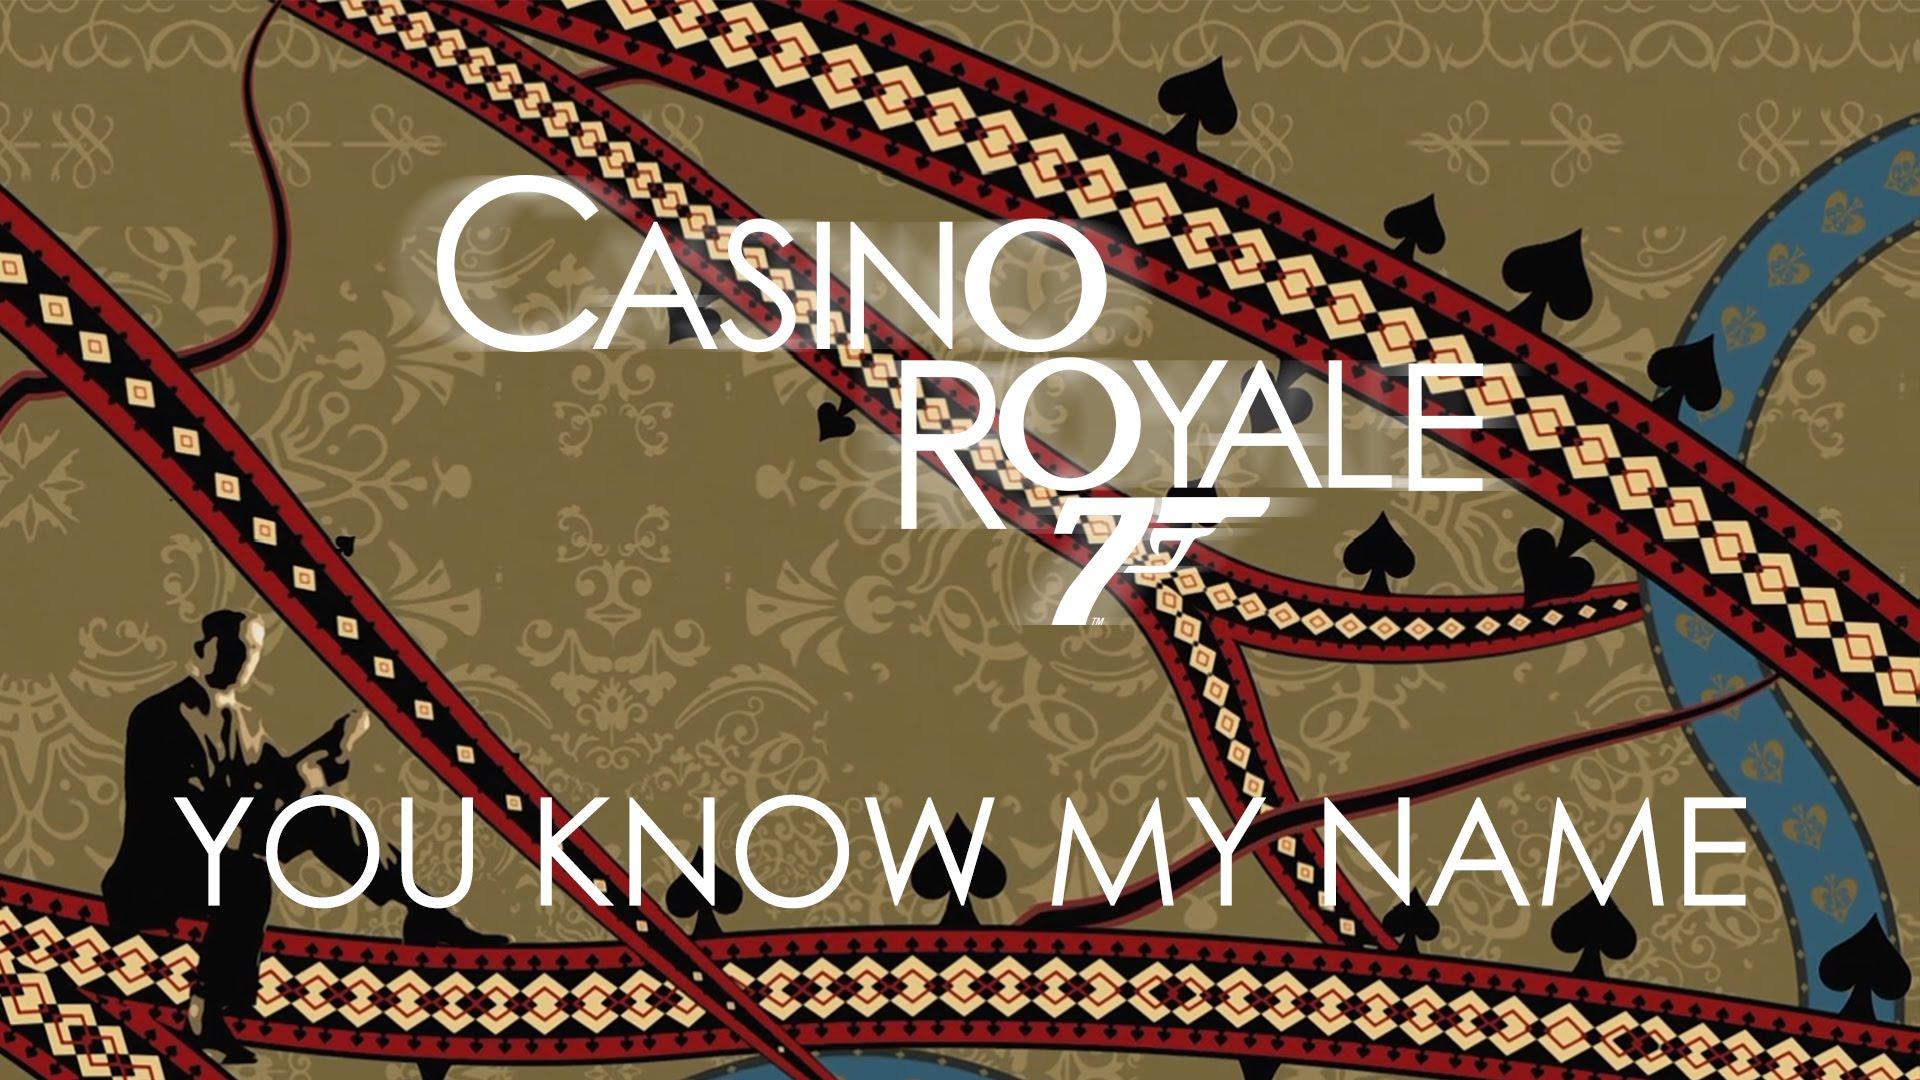 Casino royale canzone famosa